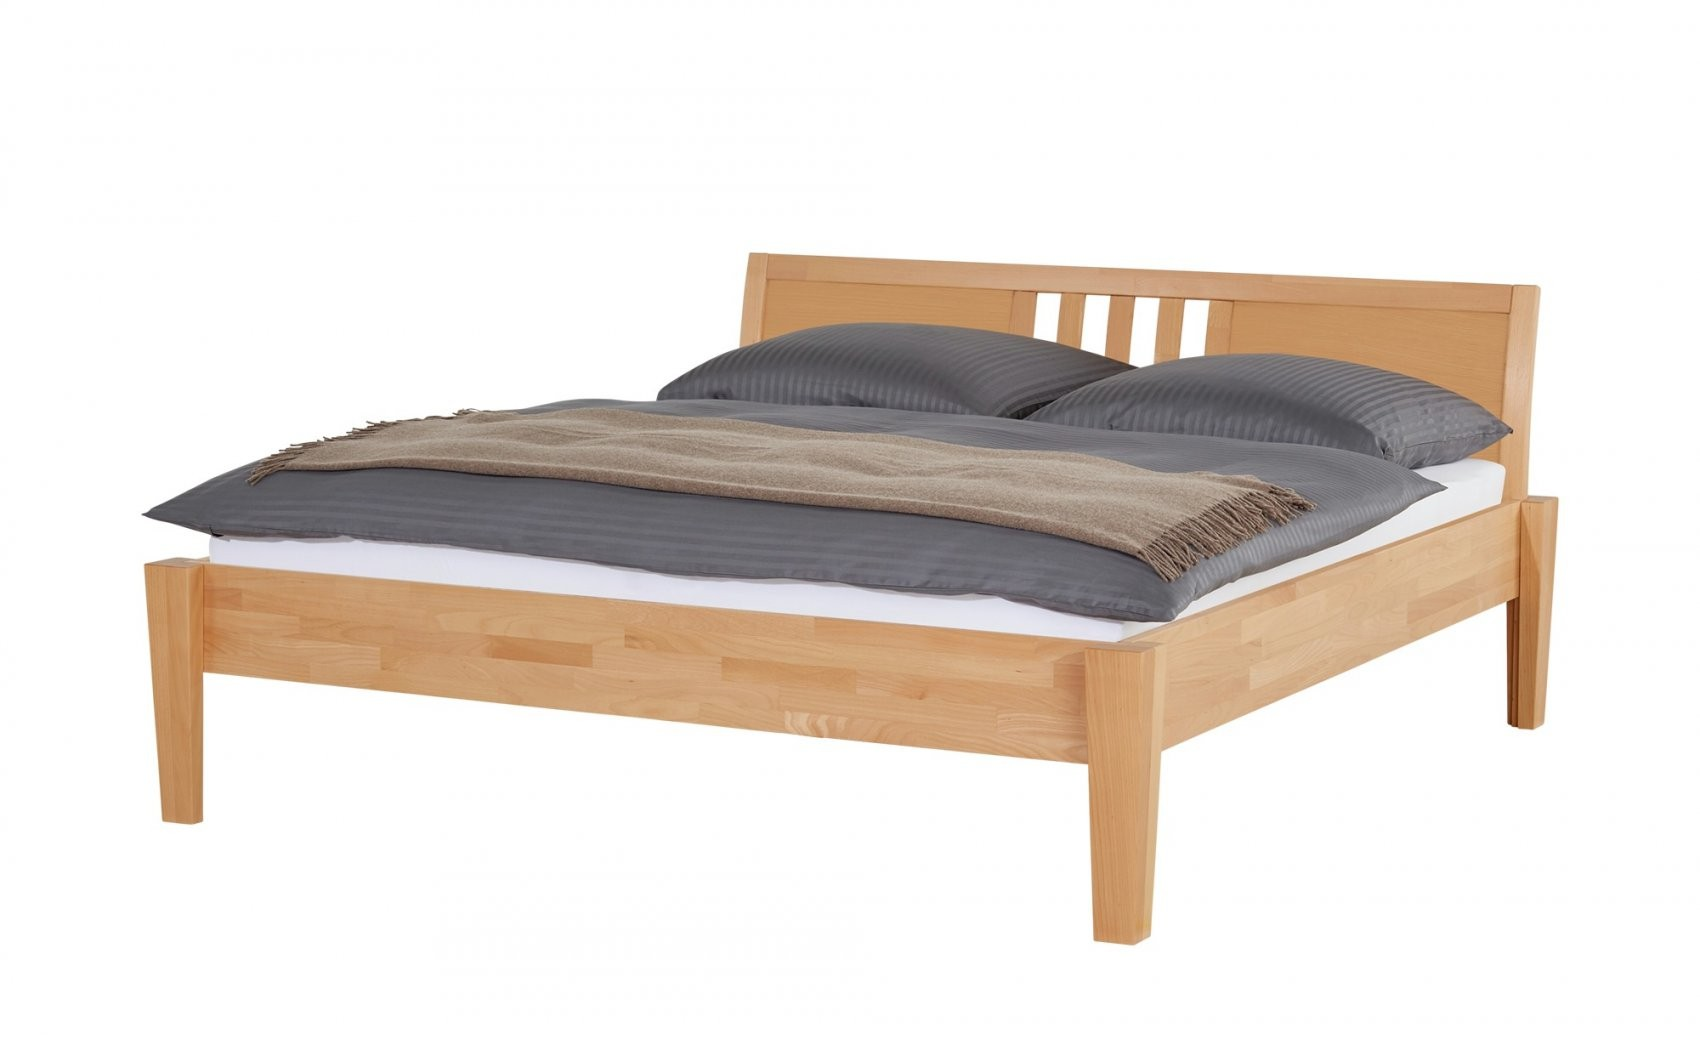 Massivholzbettgestell 140X200  Buche Timber  140 Cm Buche von Bettgestell Buche 140X200 Bild